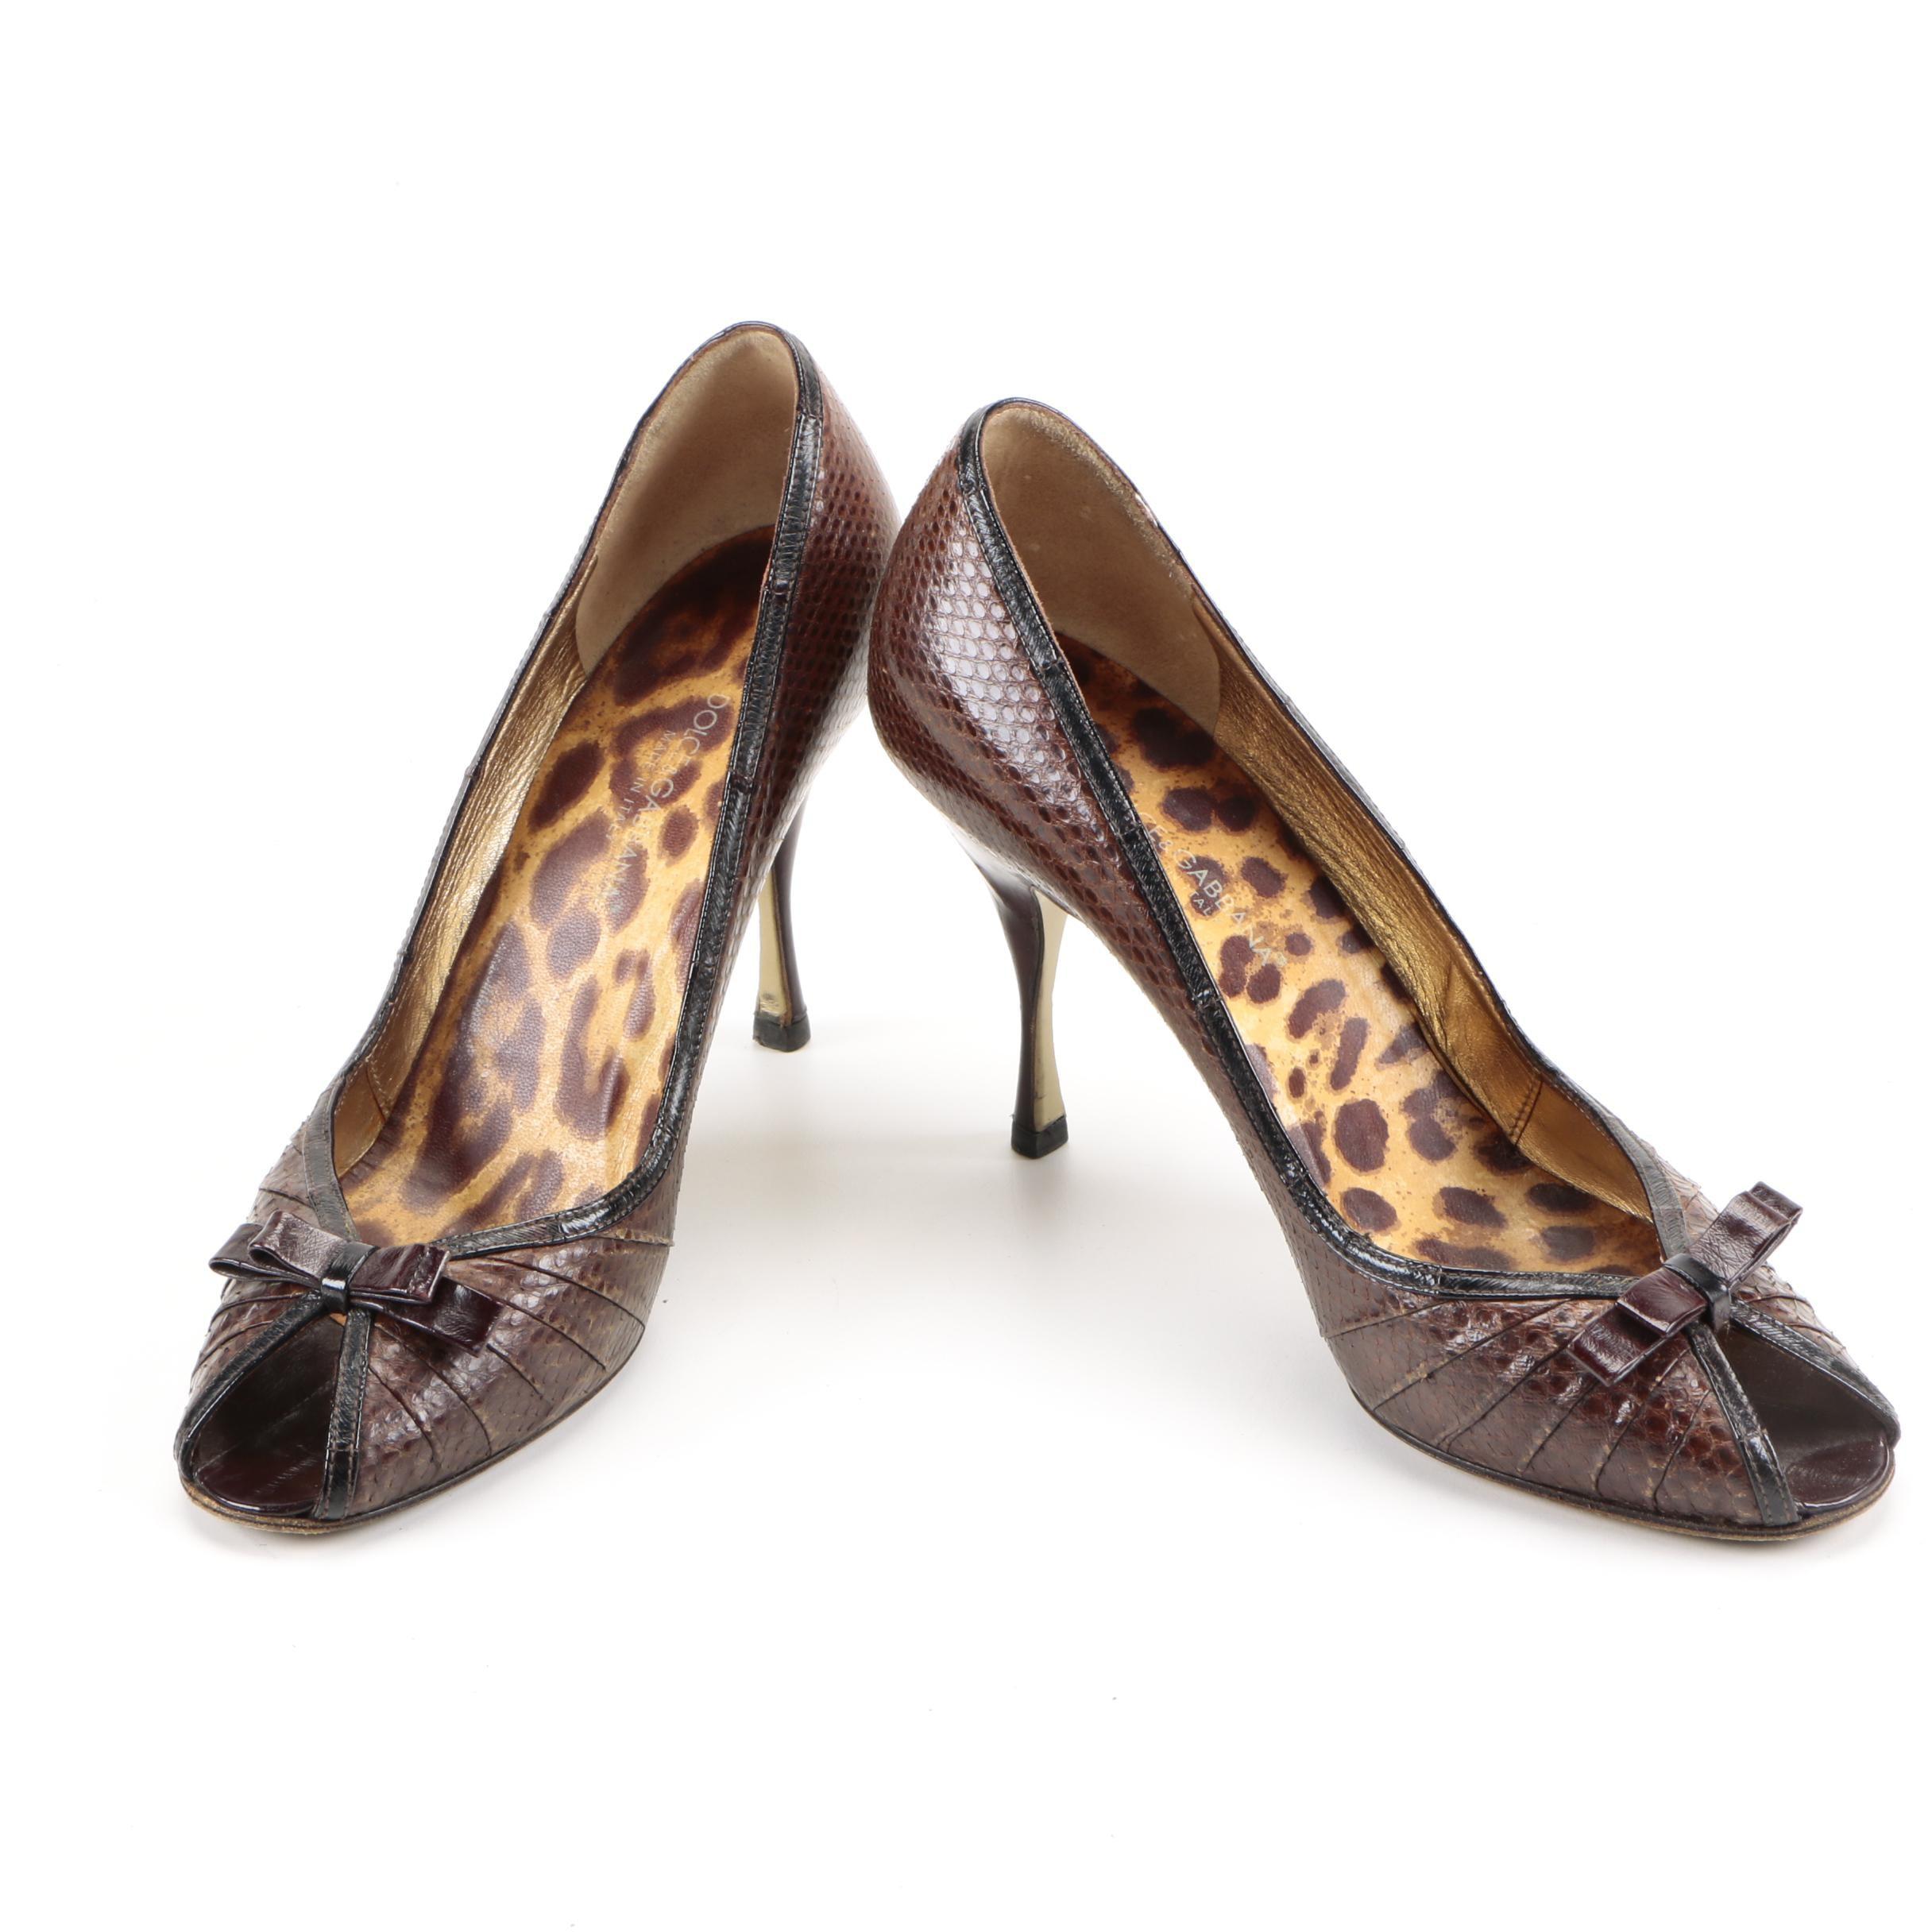 Dolce & Gabbana Snakeskin Heels